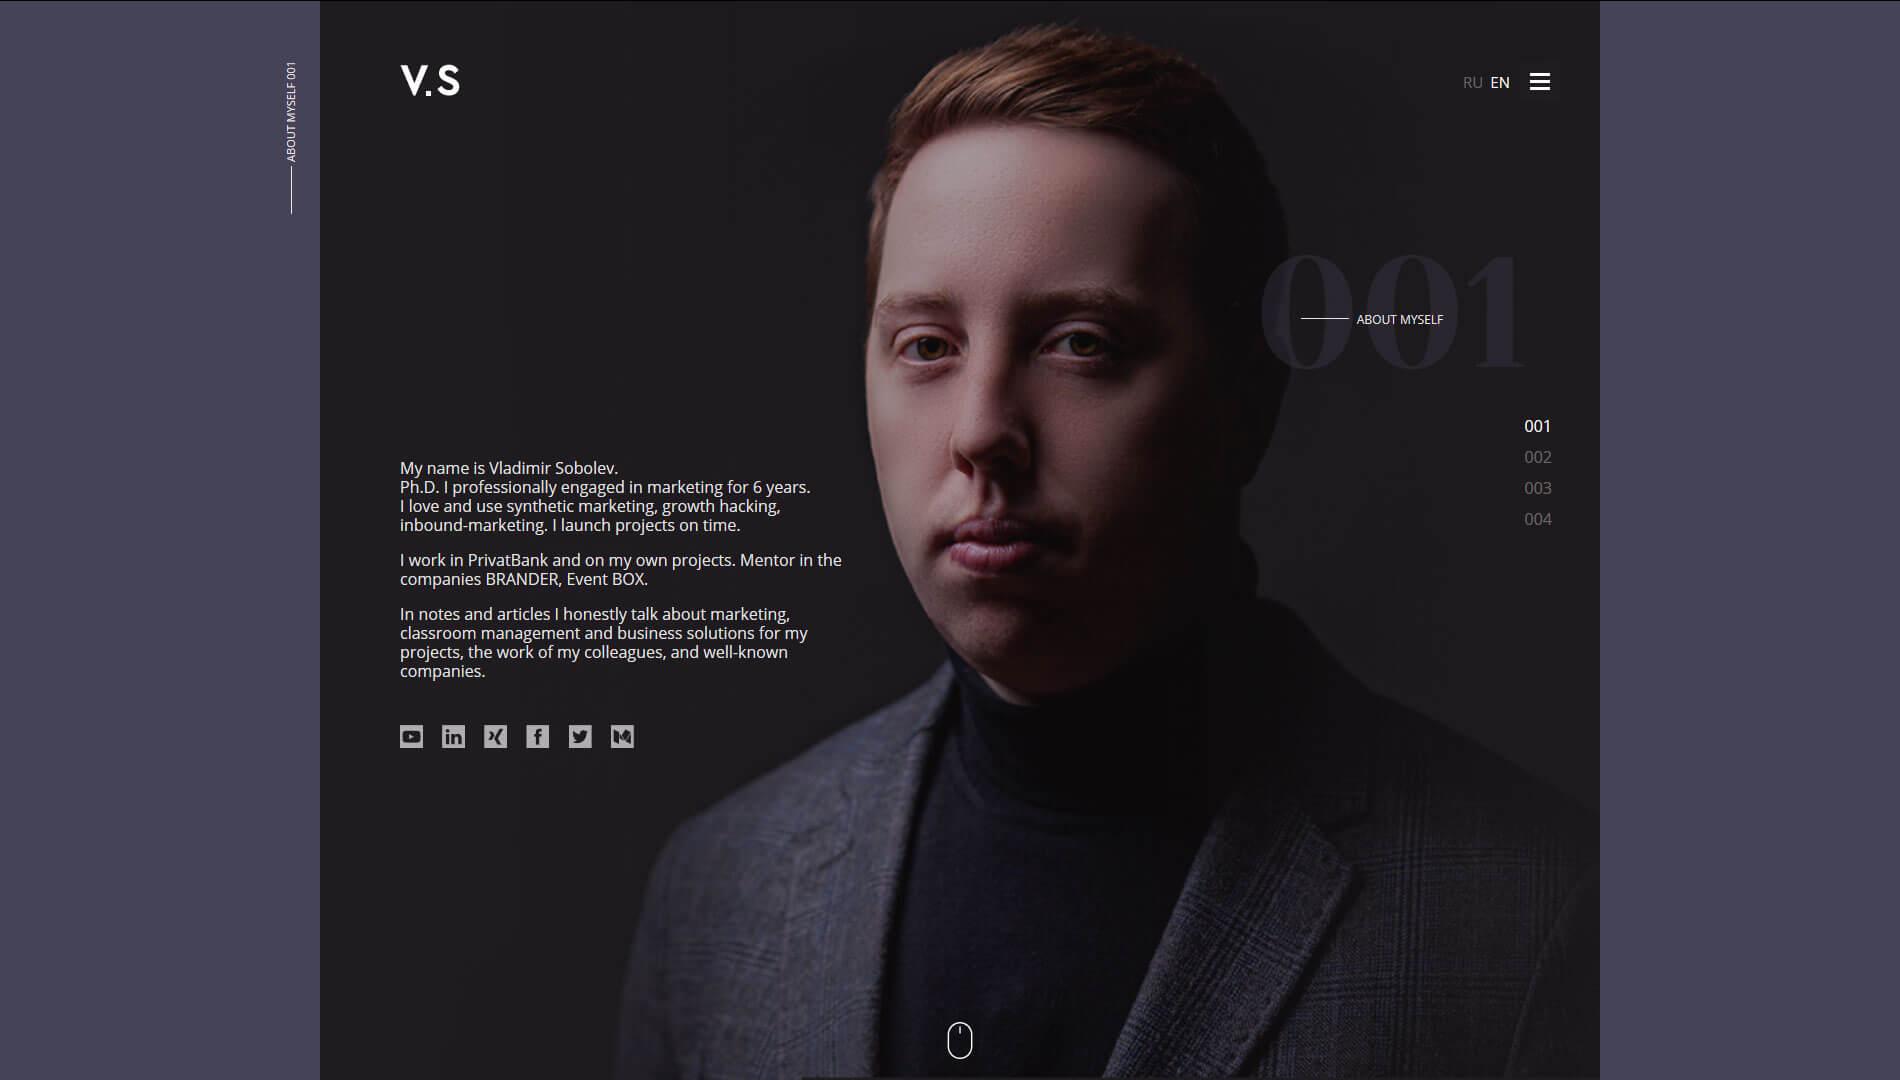 Создание сайта для маркетолога Vladimir Sobolev